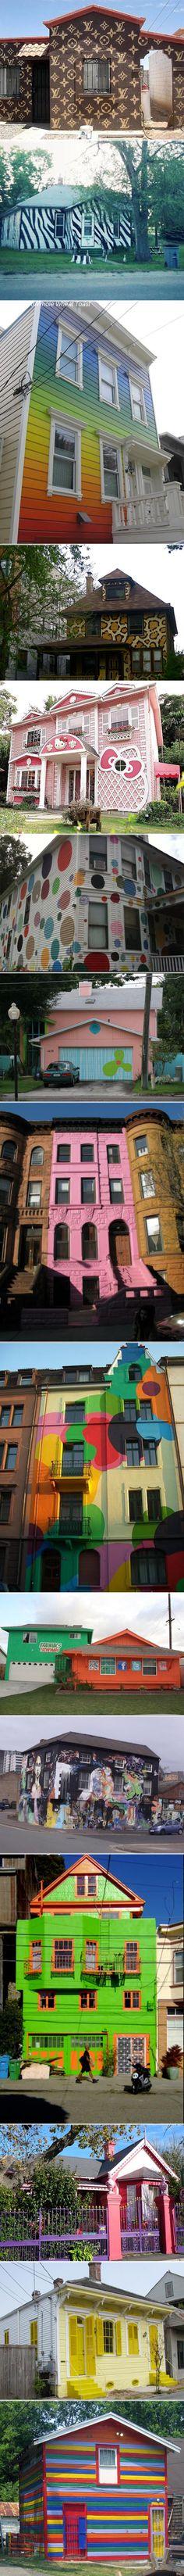 Crazy house paint jobs.